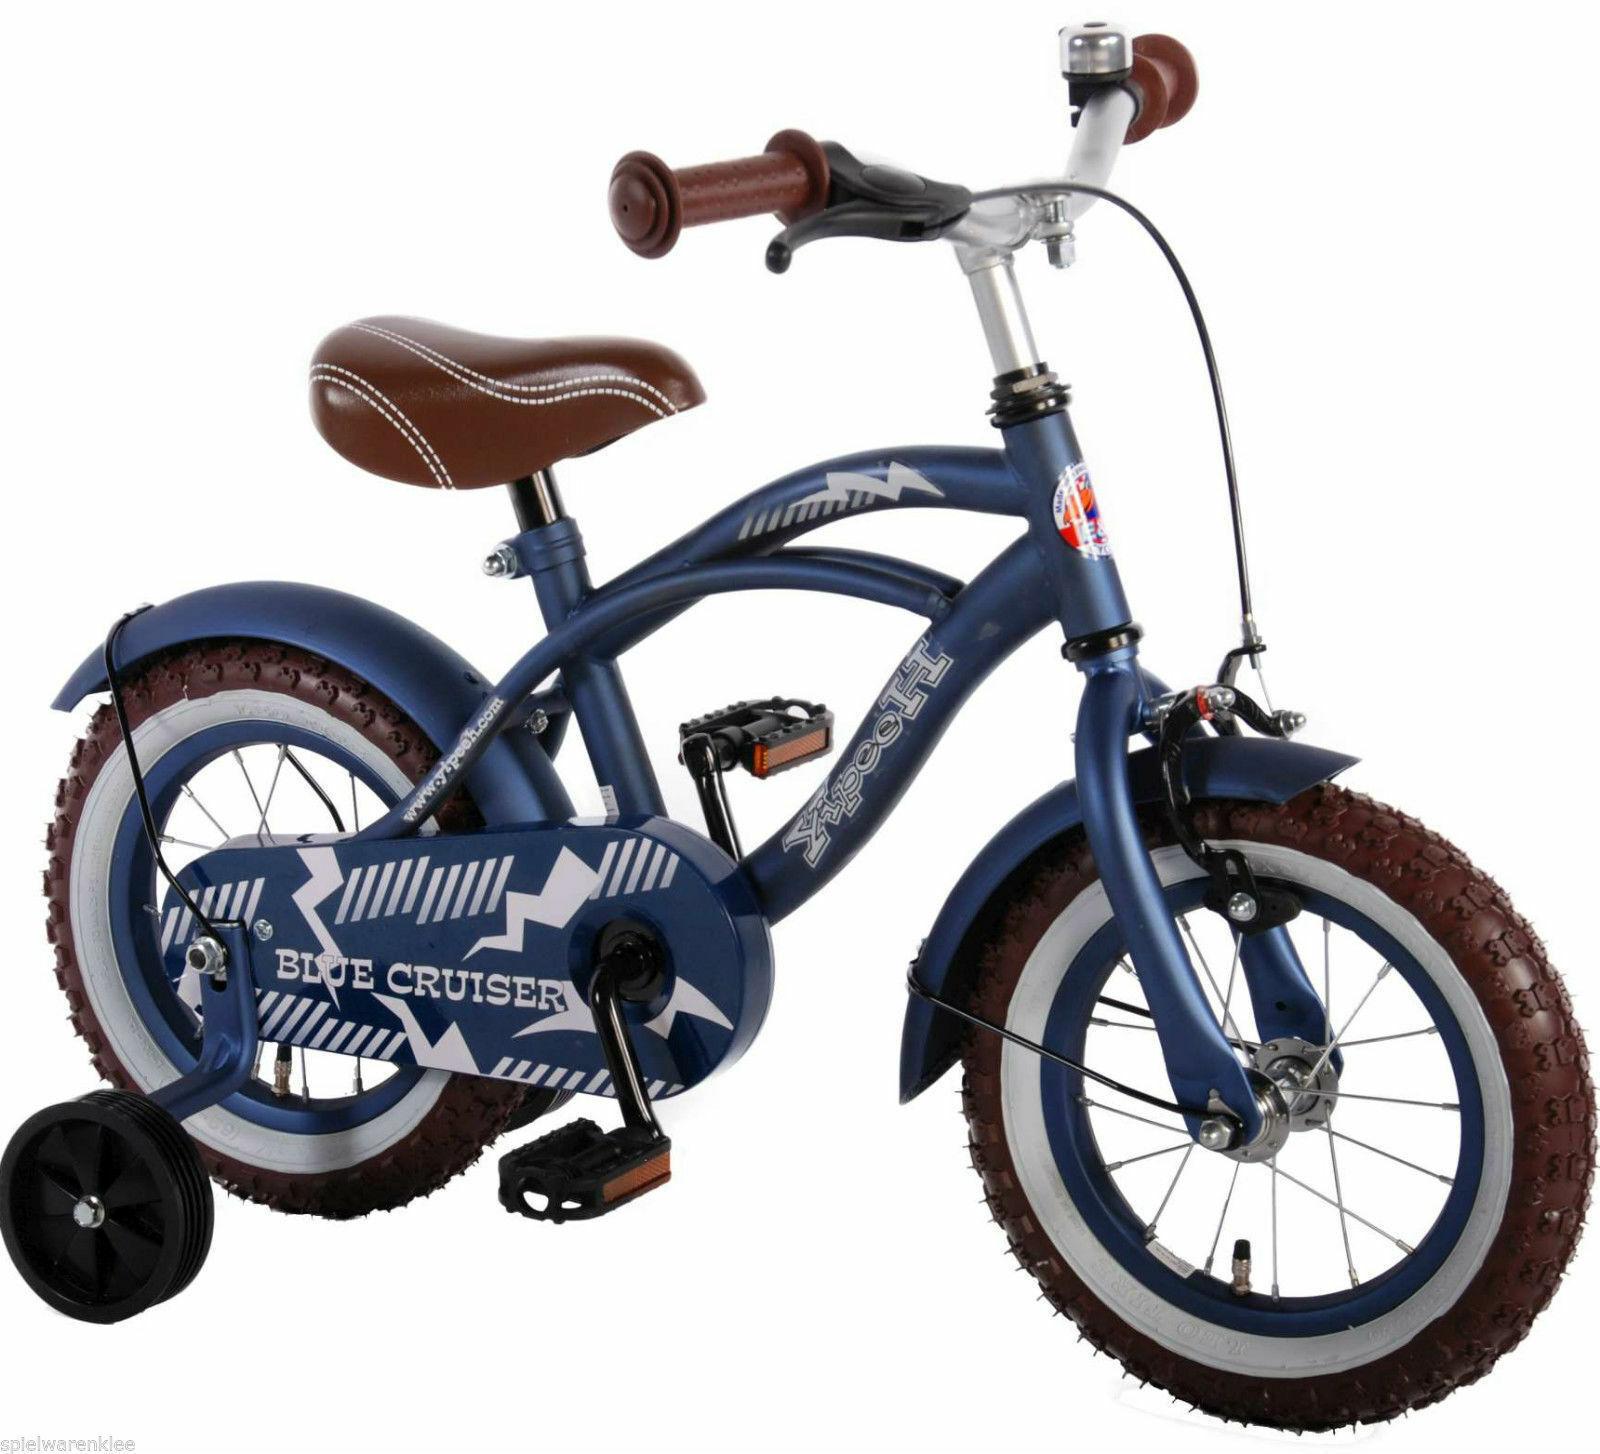 12 Zoll Fahrrad Qualitäts Kinderfahrrad matt Blau Stützräder Blau Cruiser 51201